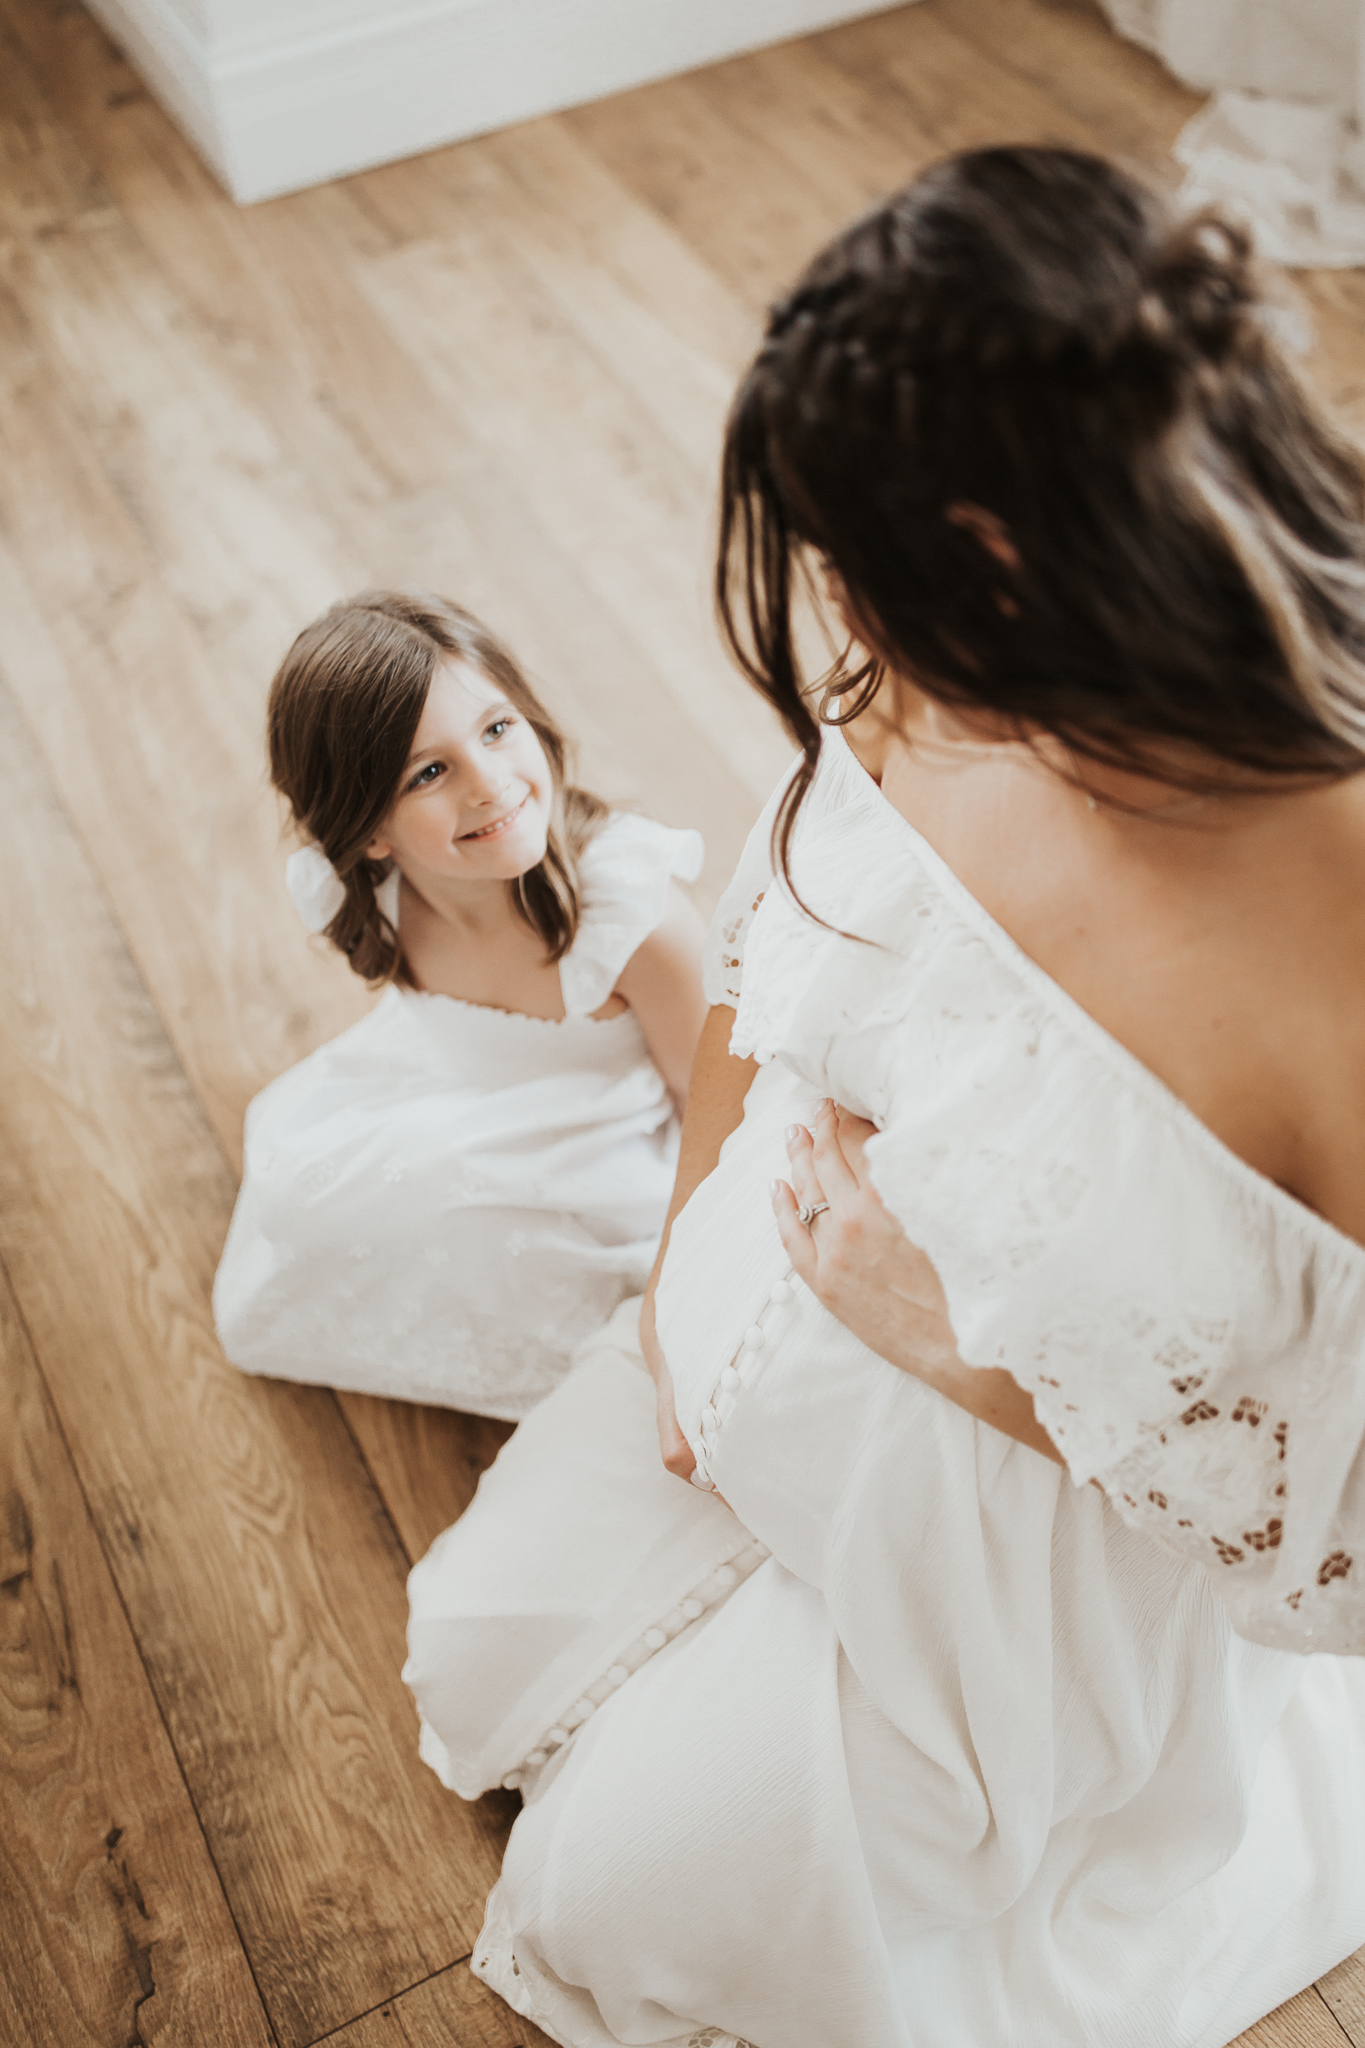 Hines_Maternity-16.jpg